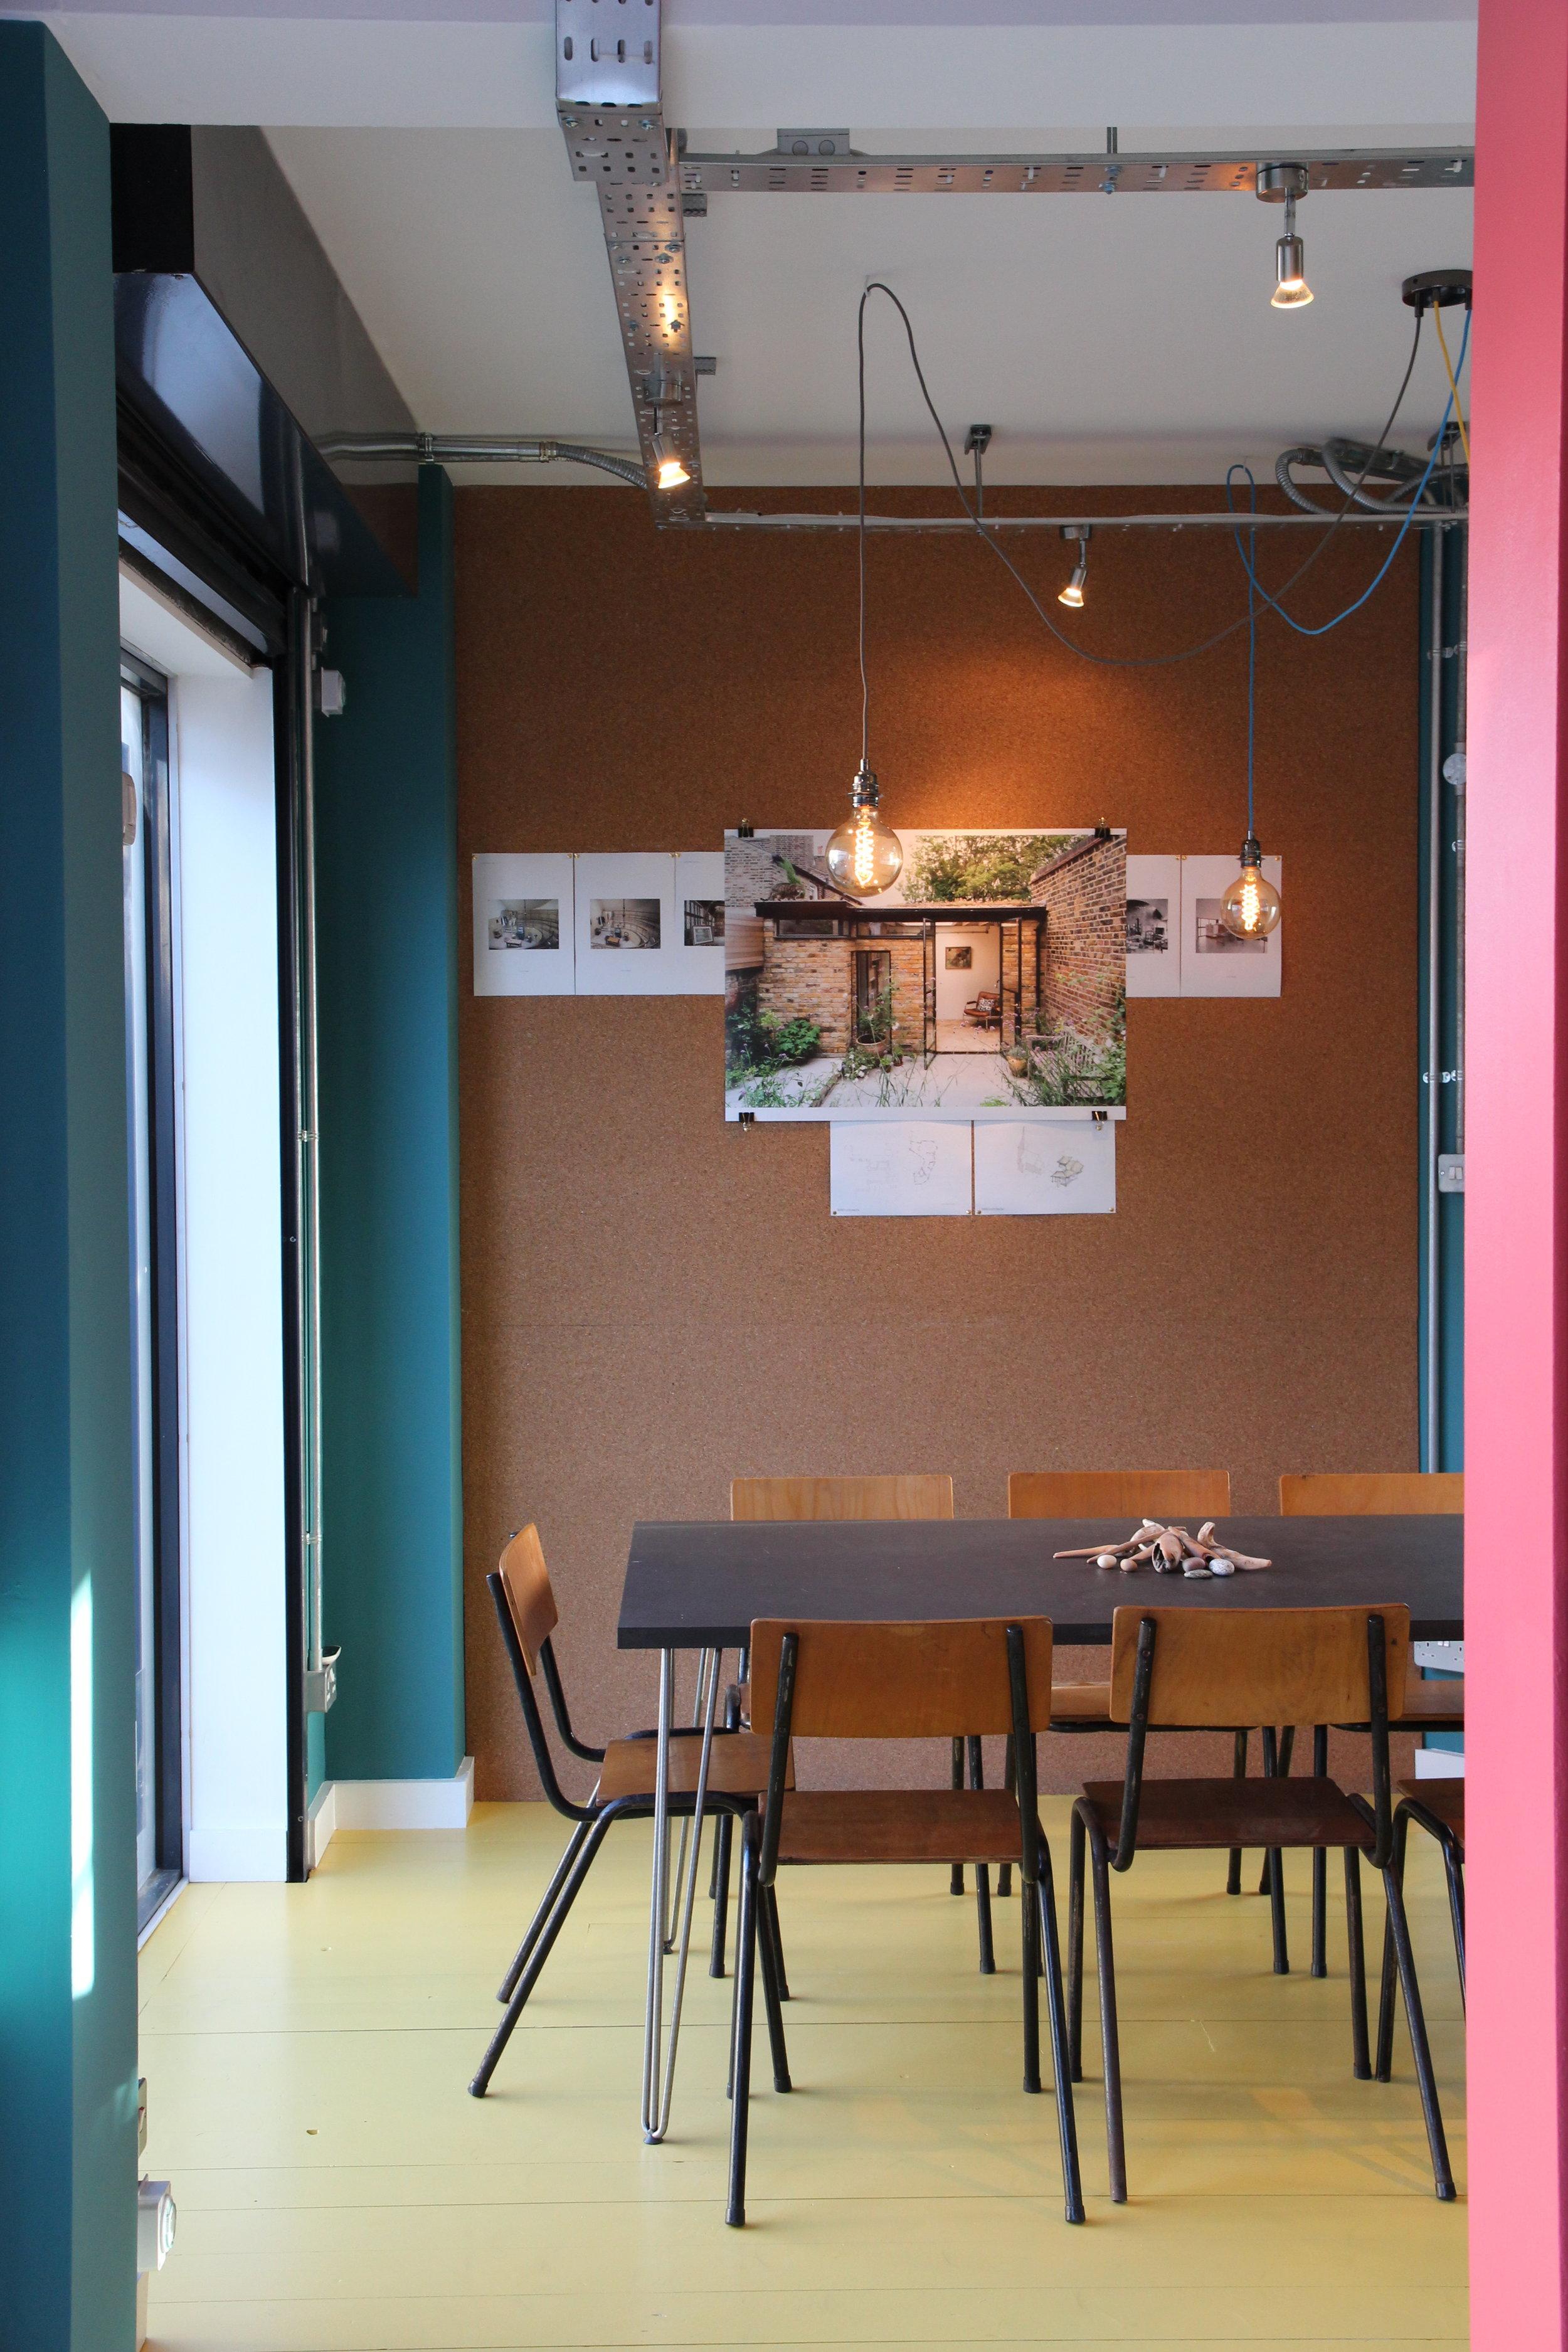 Meeting Table MW Architects studio